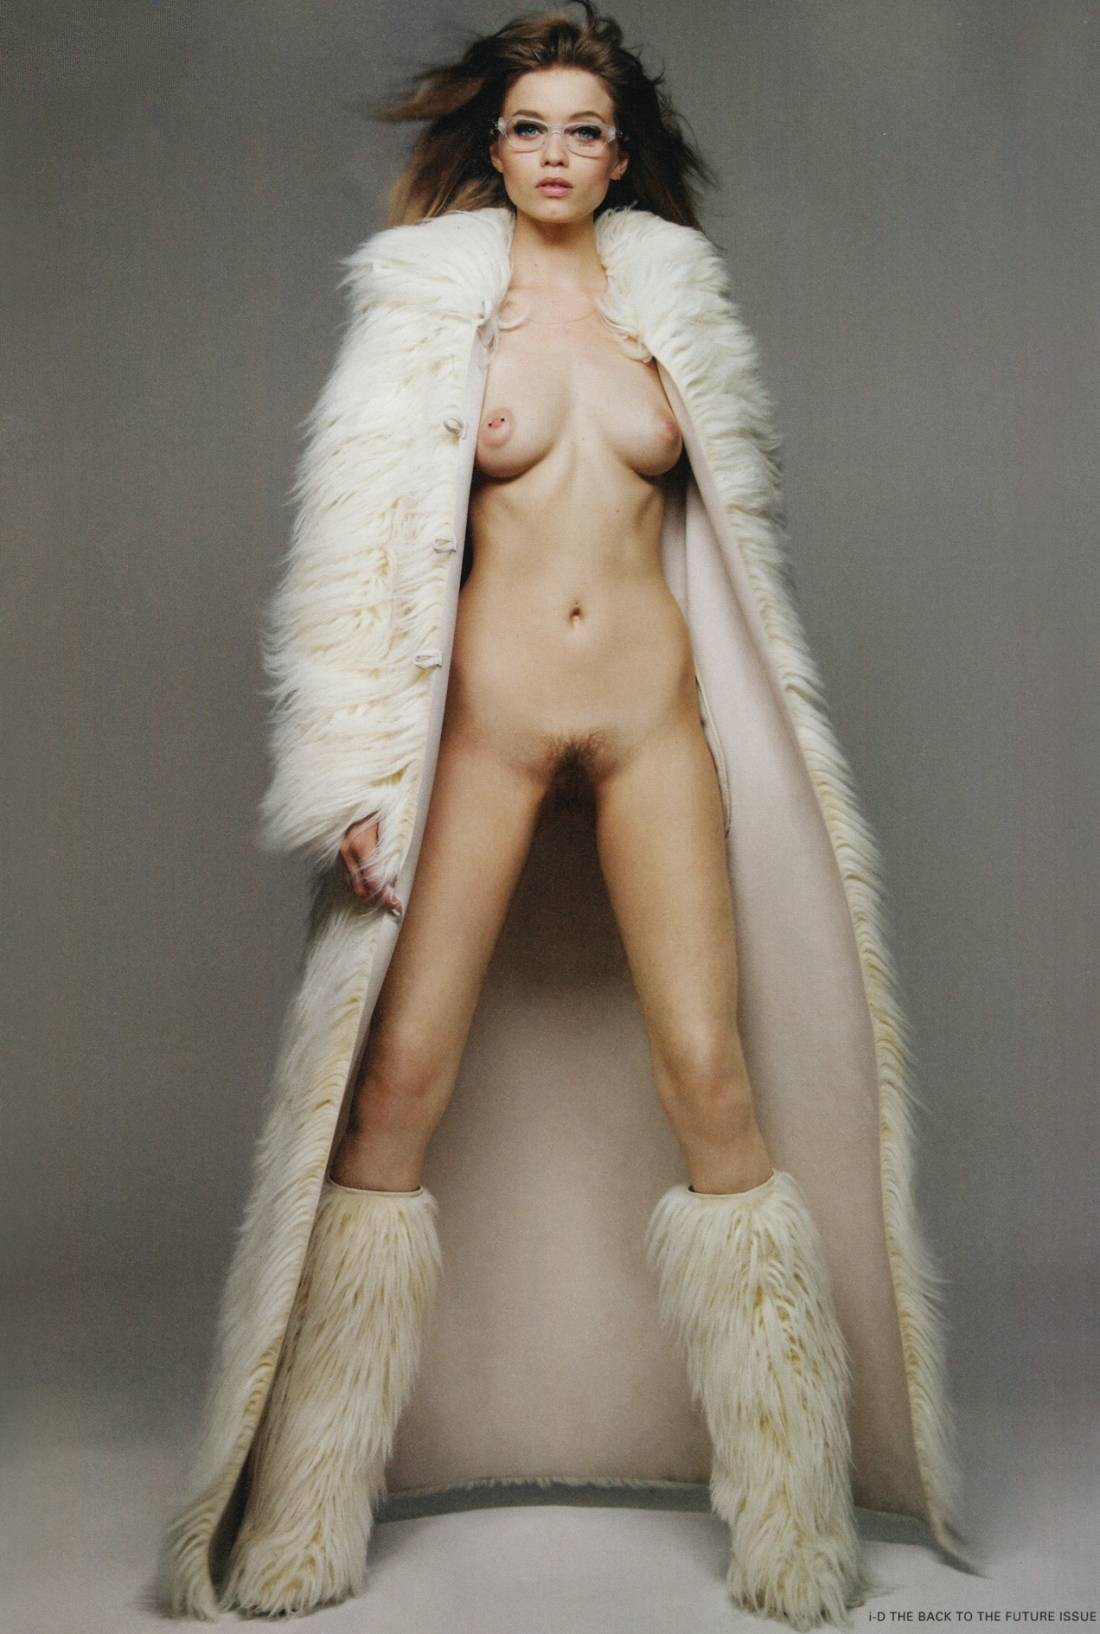 Model Abbey Lee Kershaw Leaked Nudes